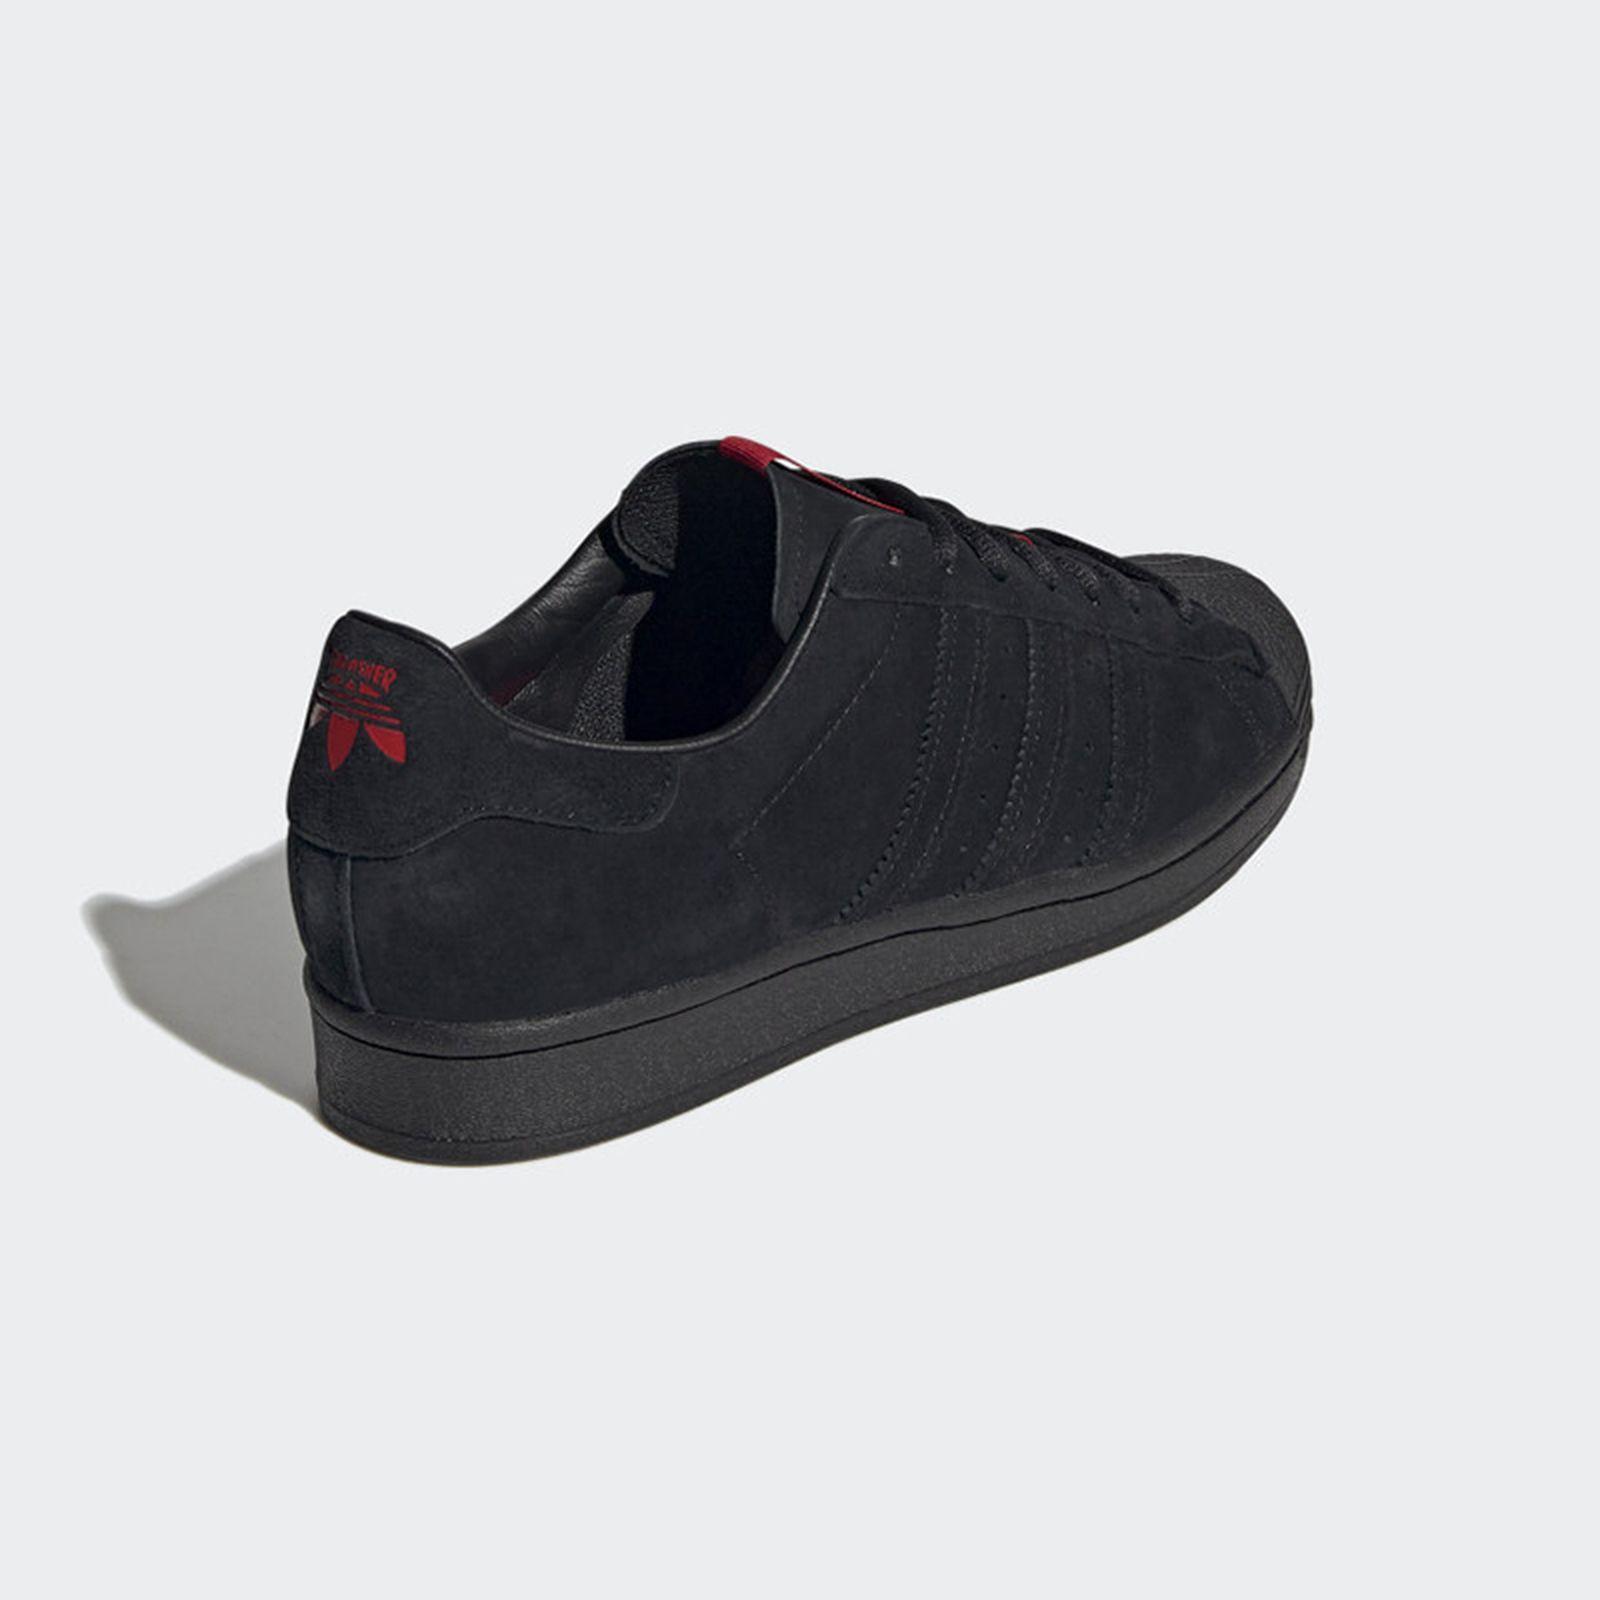 thrasher-adidas-superstar-adv-tyshawn-jones-release-date-price-1-04